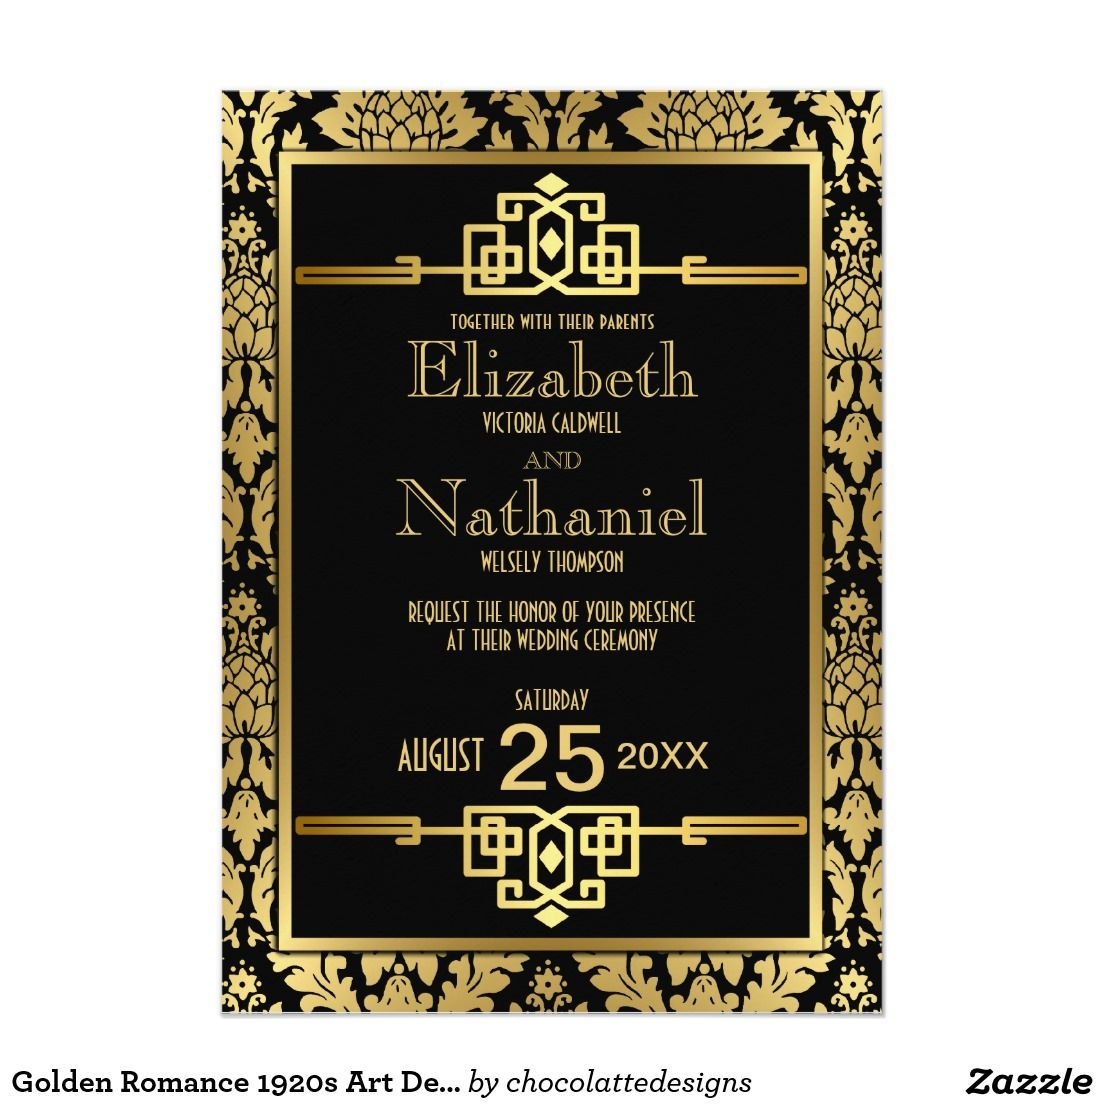 Golden Romance 1920s Art Deco Wedding Invitation   Deco wedding ...